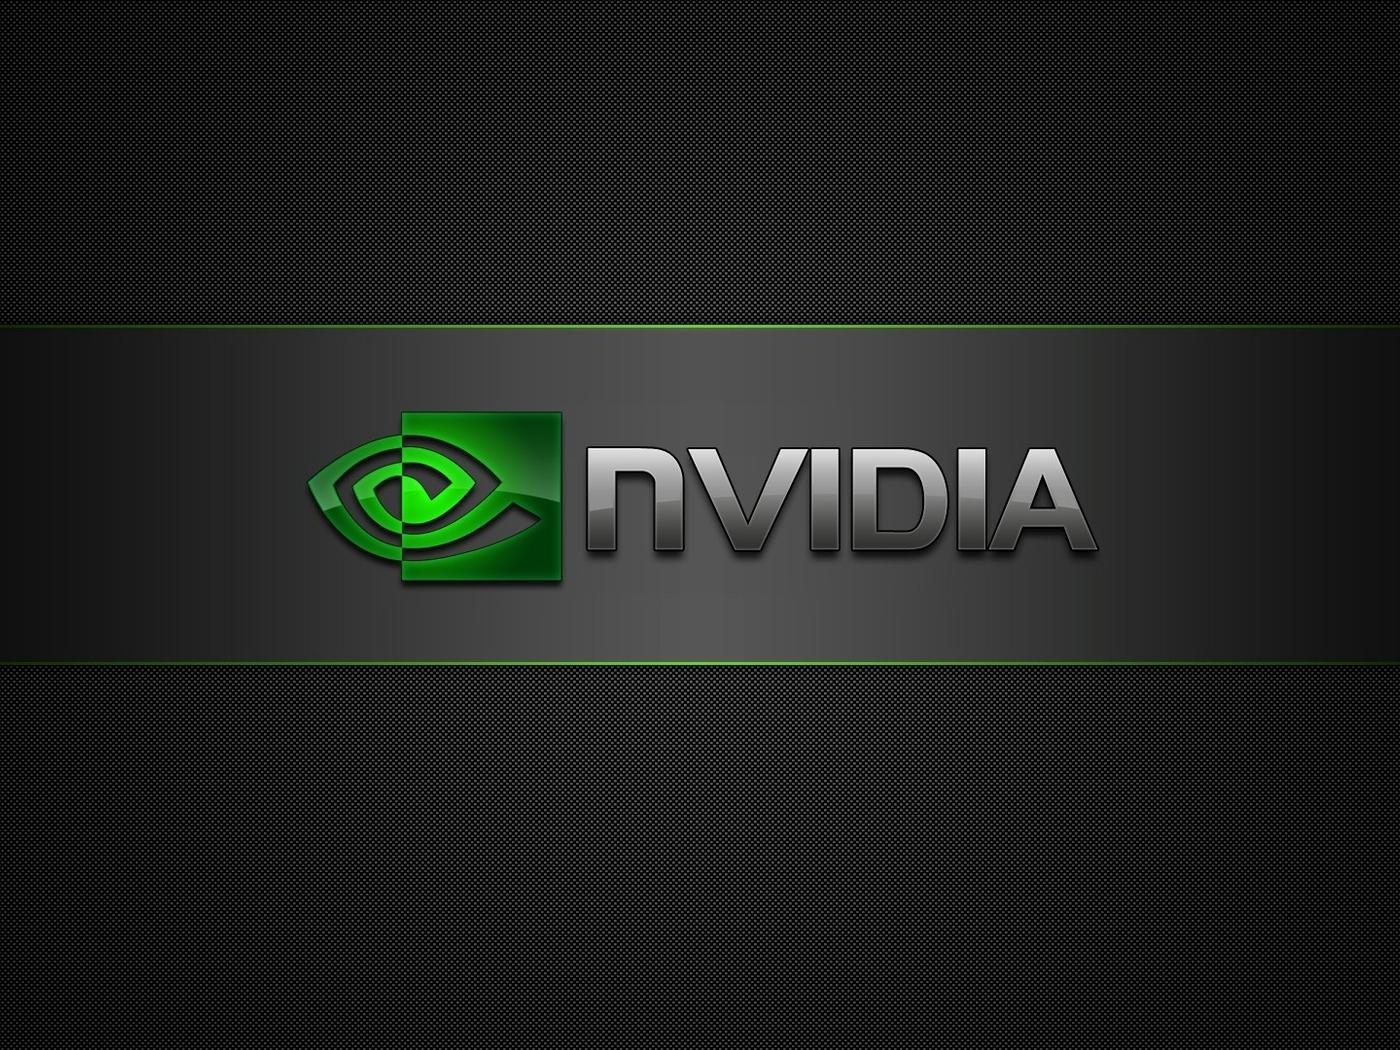 1400x1050 Nvidia Brand Logo 1400x1050 Resolution Hd 4k